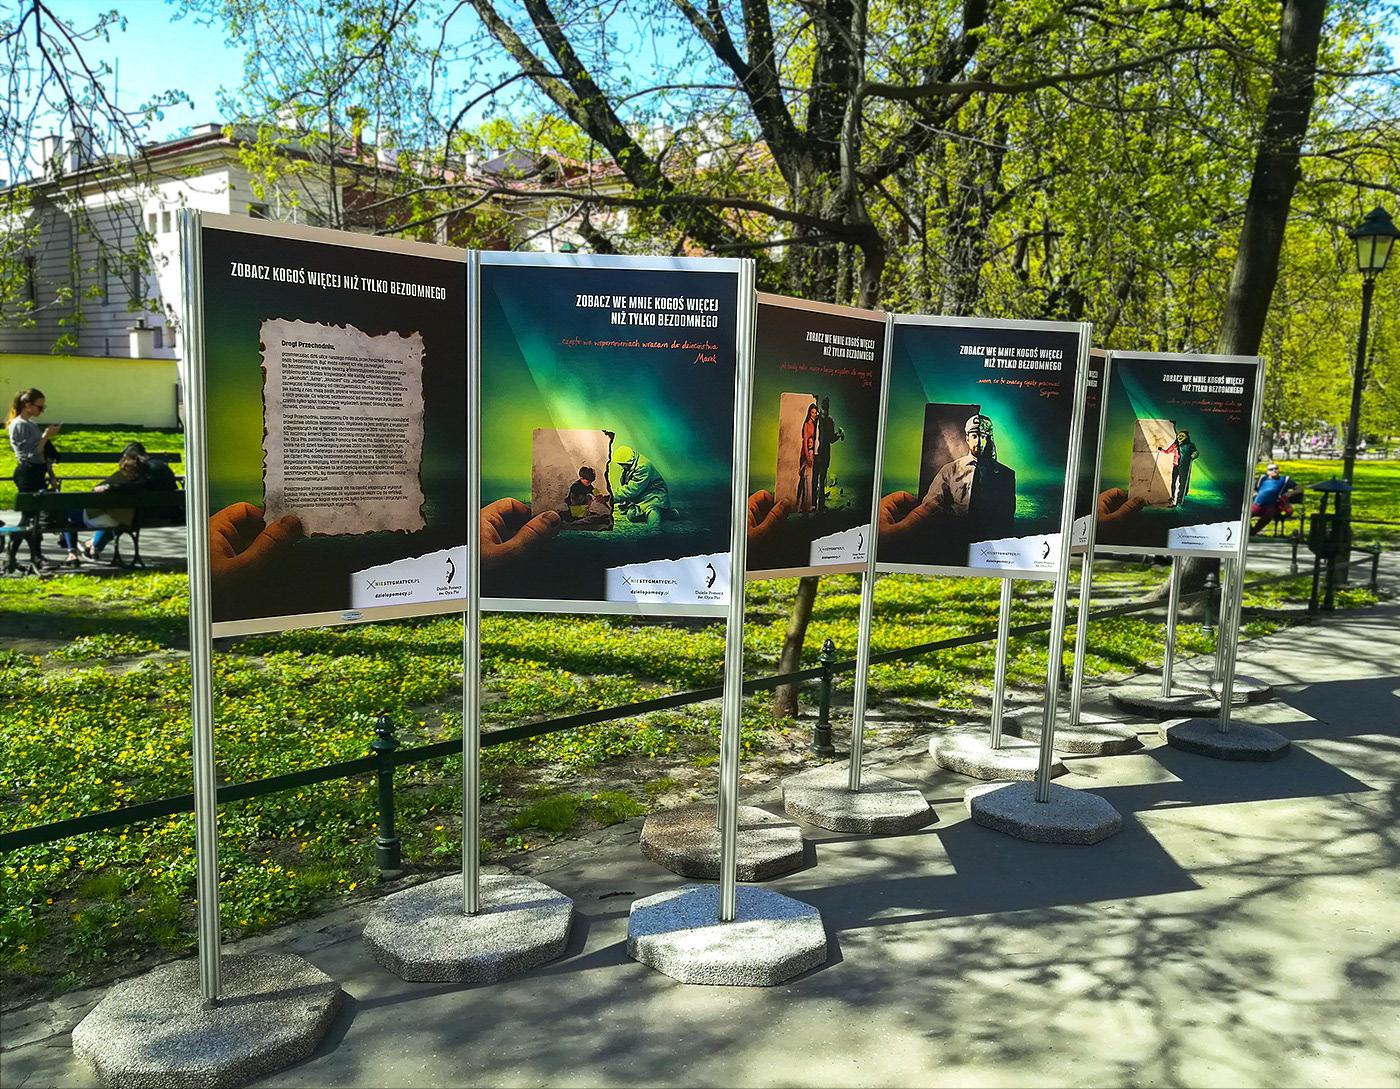 bezdomny BEZDOMNI homeless wystawa Exhibition  krakow stereotyp pomoc help pio